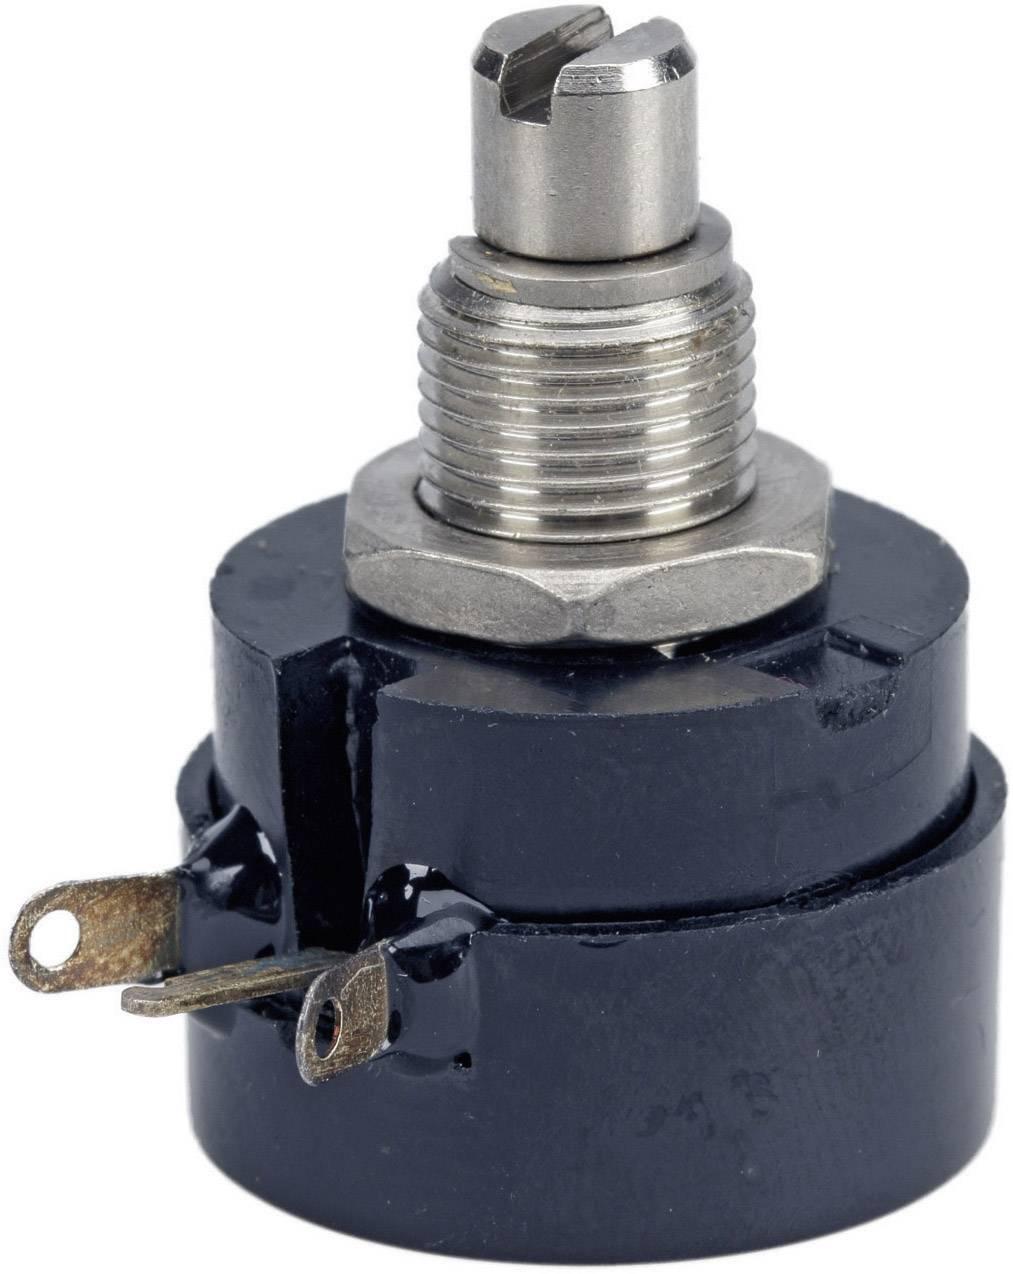 Drôtový potenciometer TT Electro, 3101106905, 50 Ω, 0.5 W, ± 10%